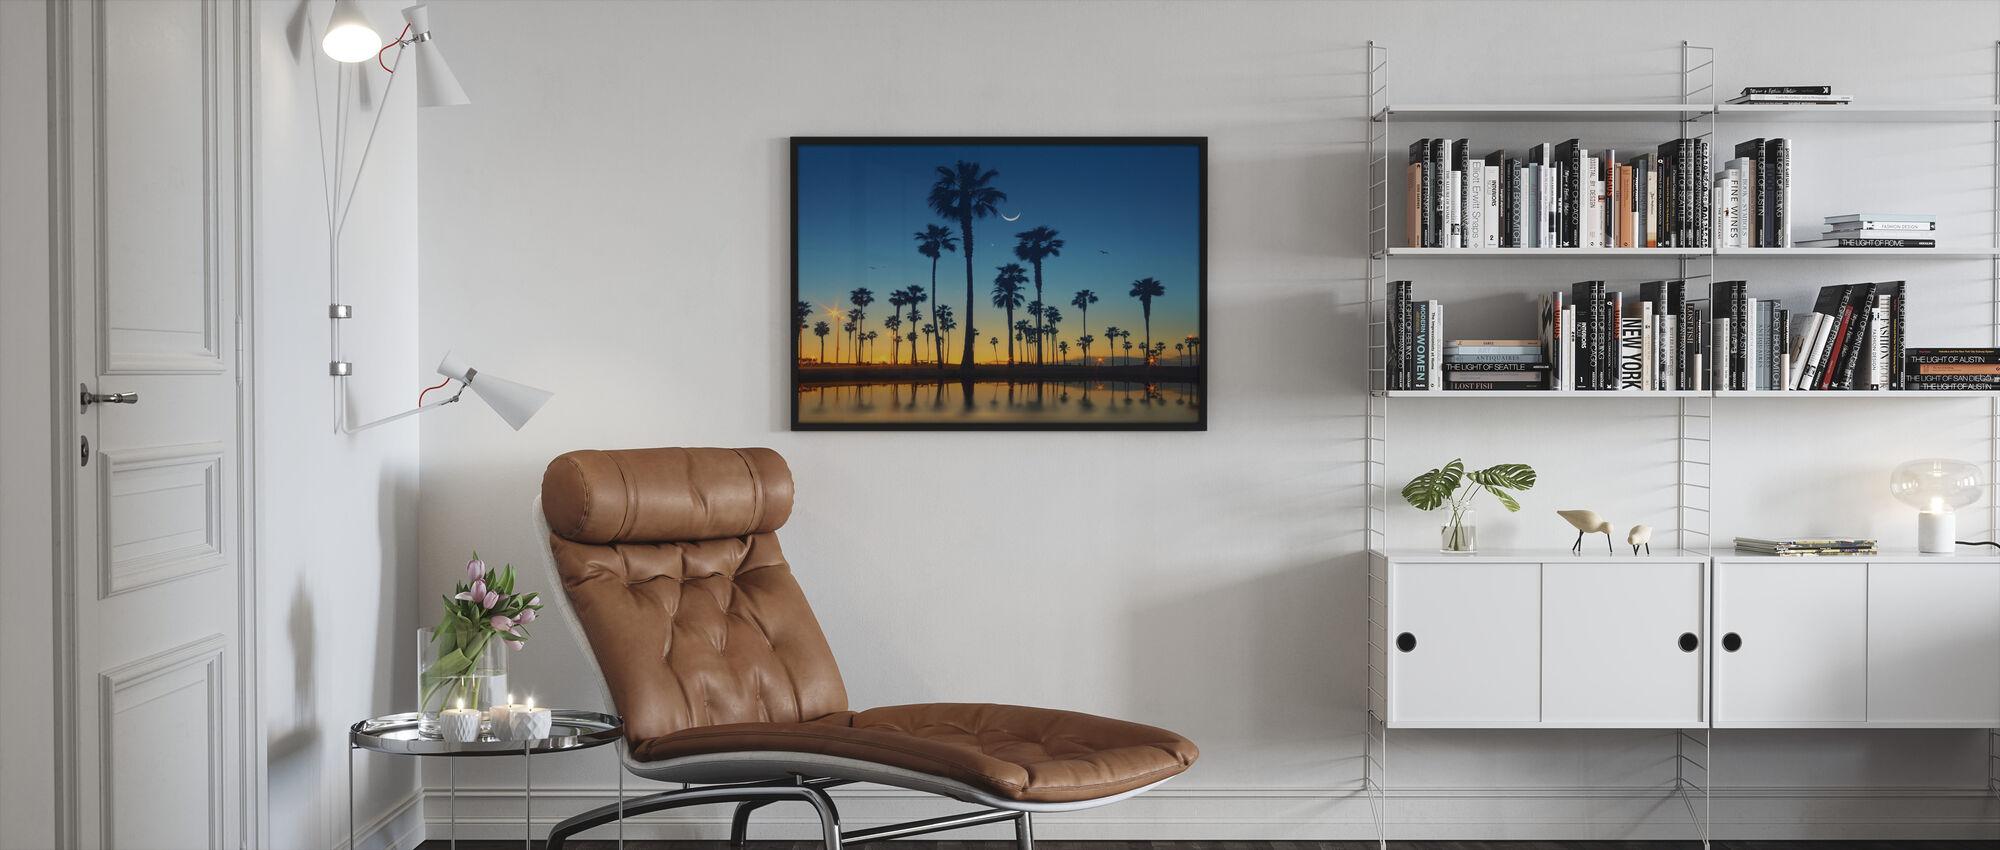 Rad av palmer - Innrammet bilde - Stue